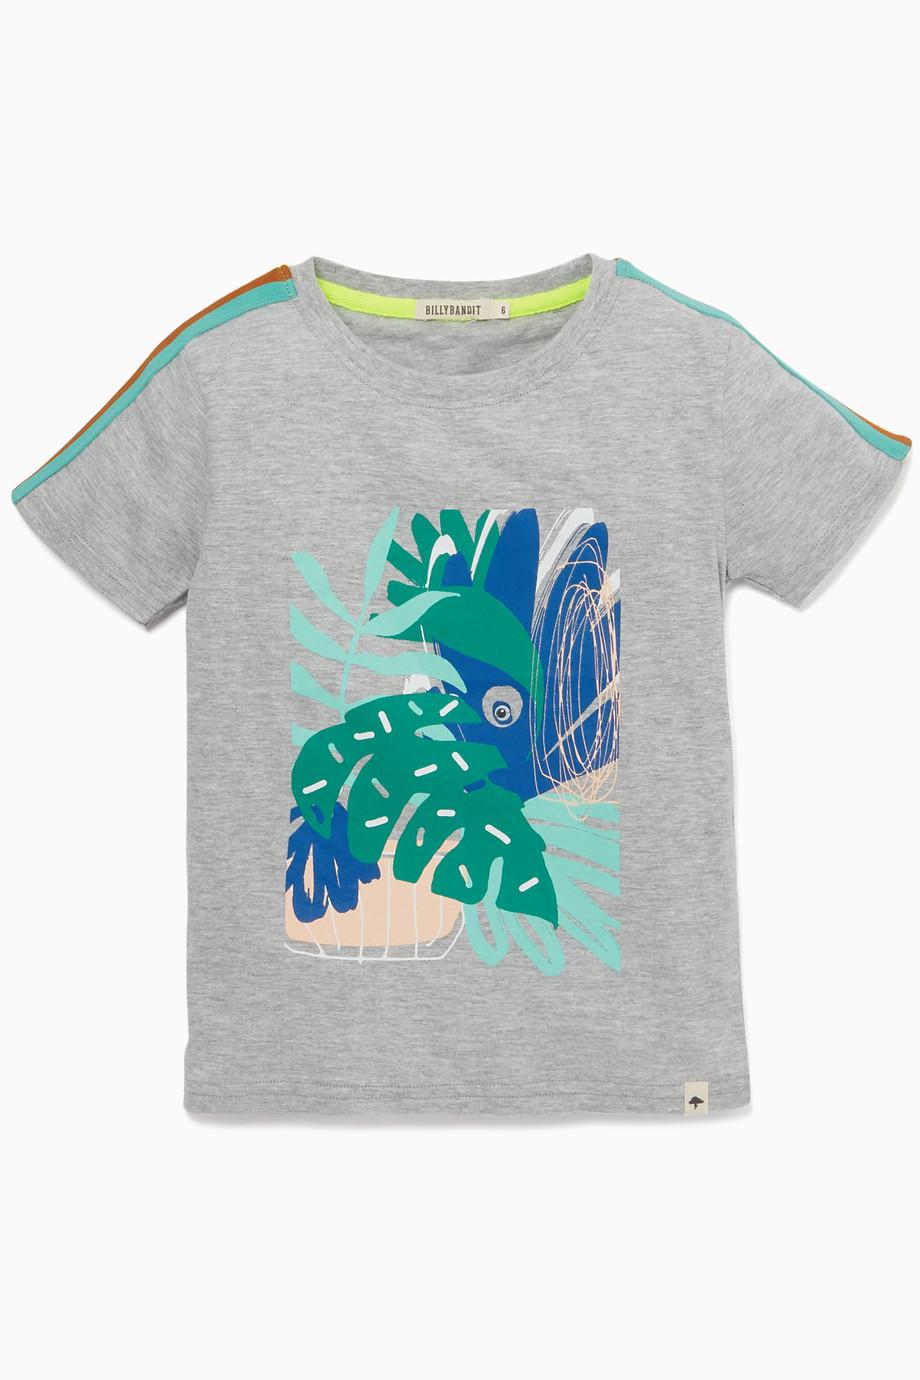 758866626 Shop Billybandit Grey Graphic Print T-Shirt for Kids